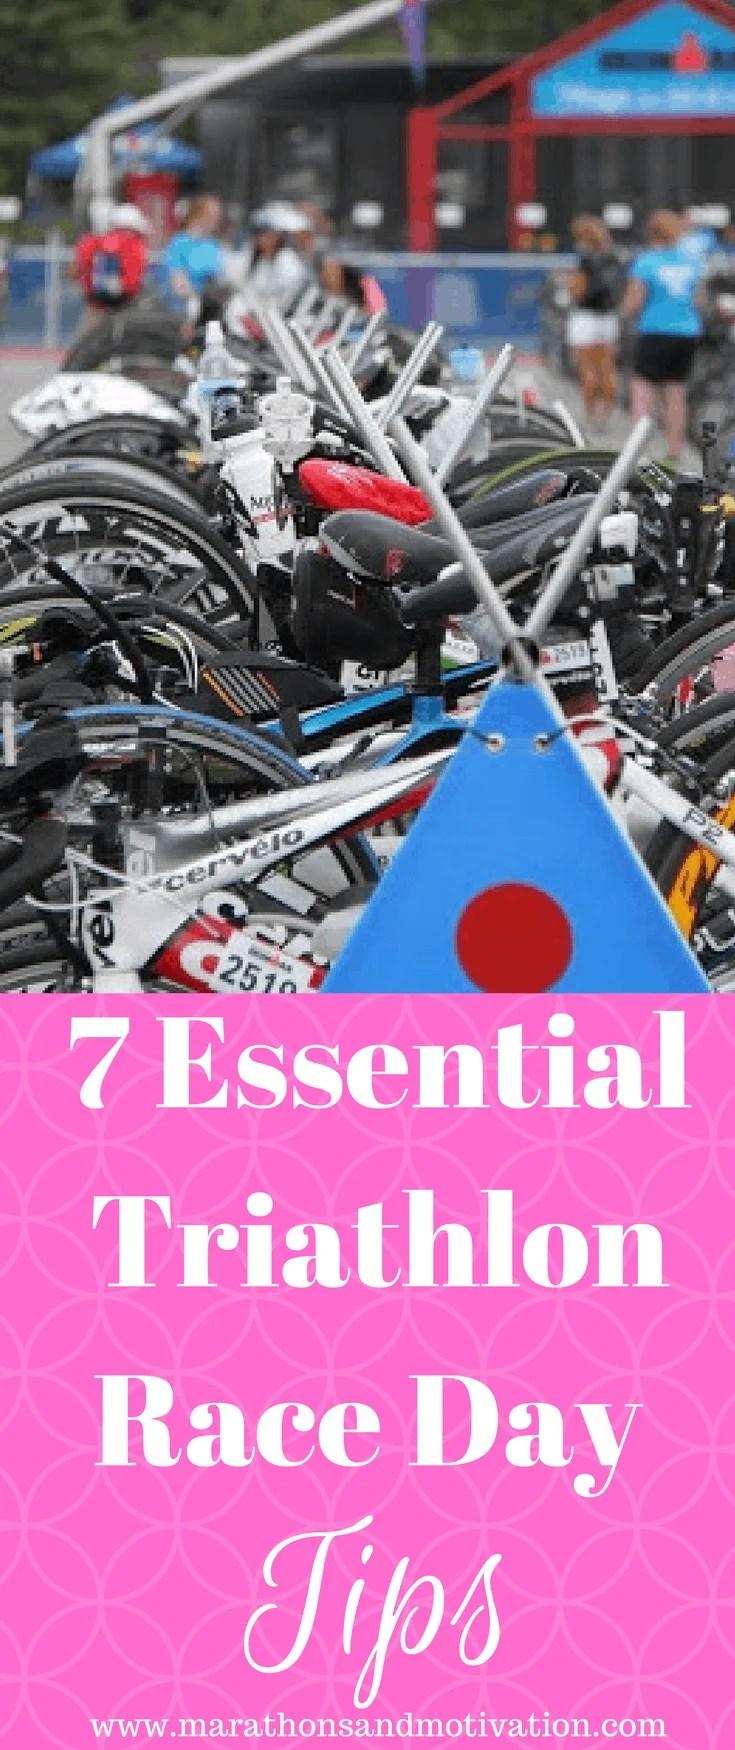 Seven Essential Triathlon Race Day Tips